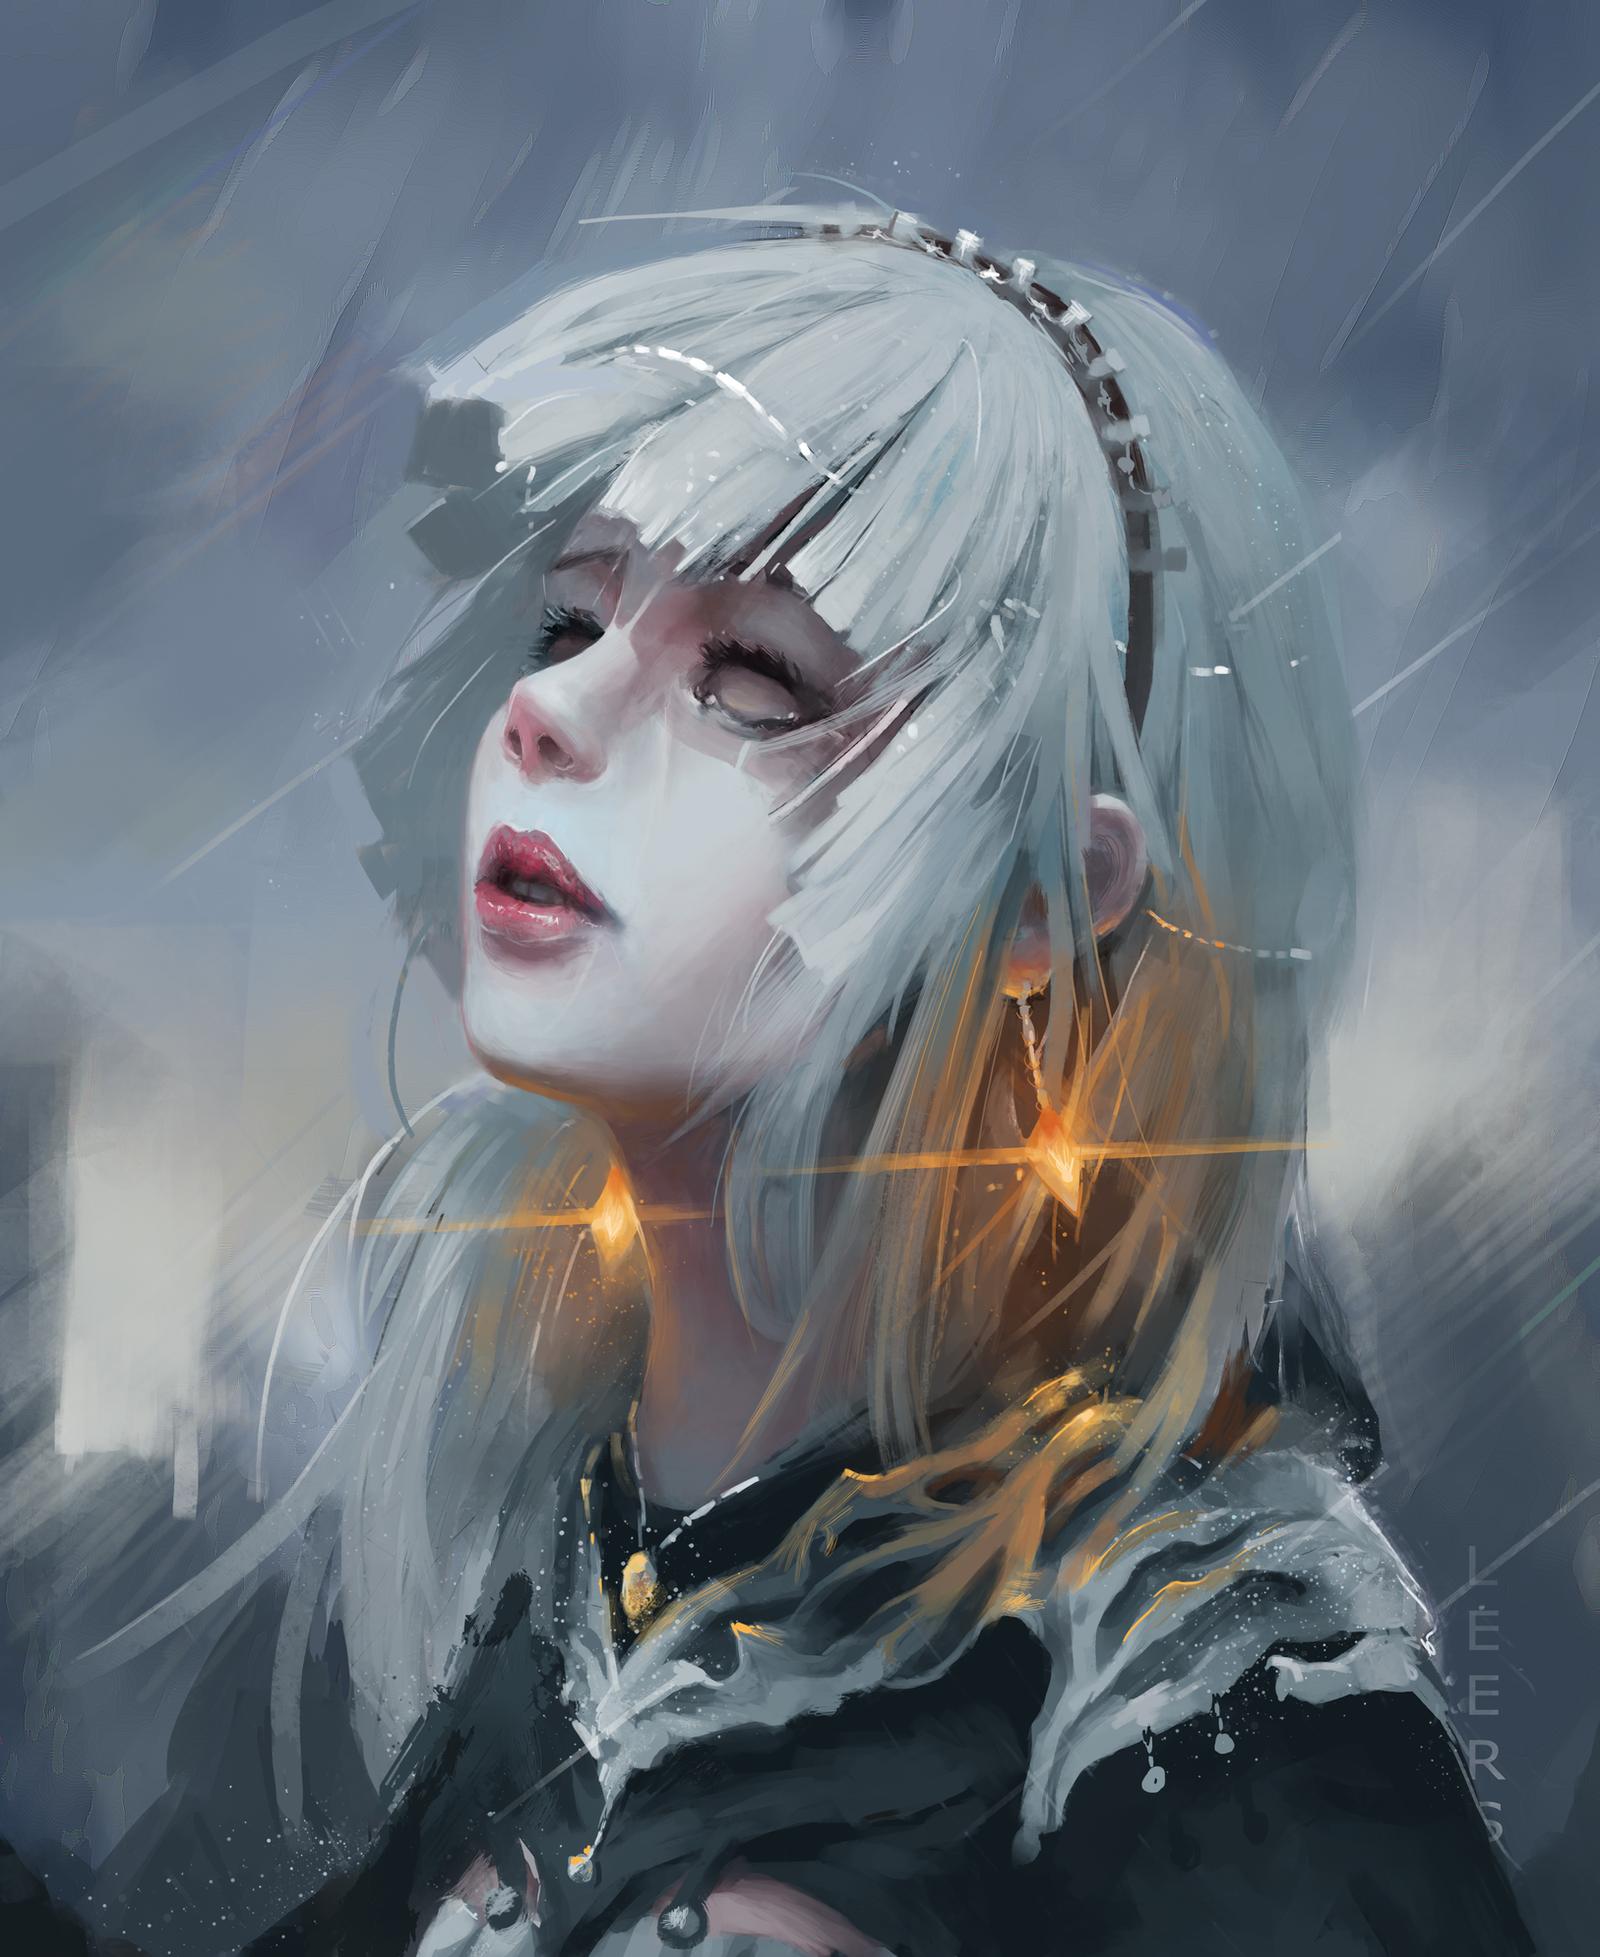 Rain Of Ignition By Leer5 On DeviantArt